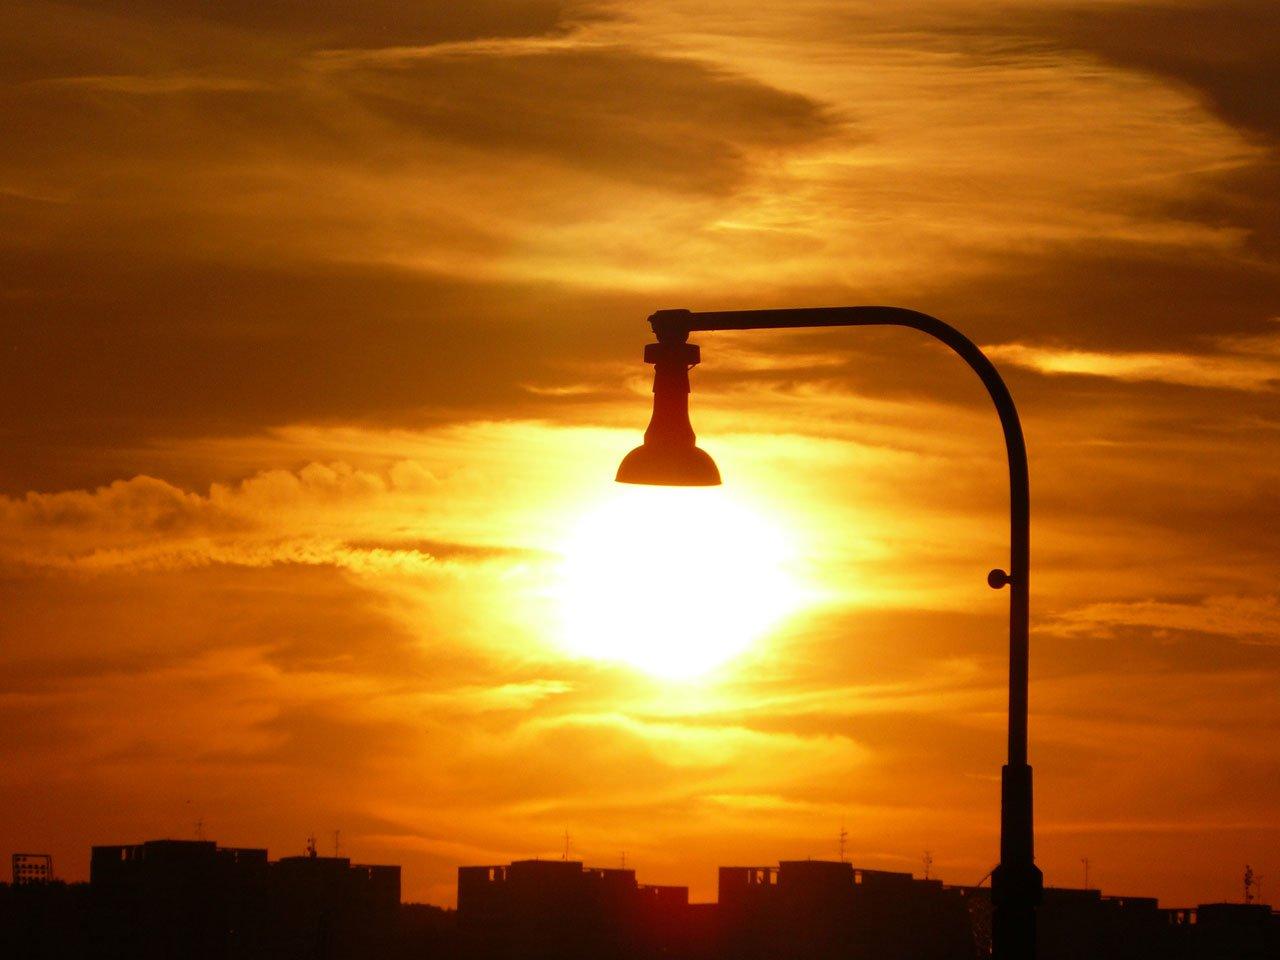 Lamp in the Morning, City, Lamp, Lantern, Light, HQ Photo